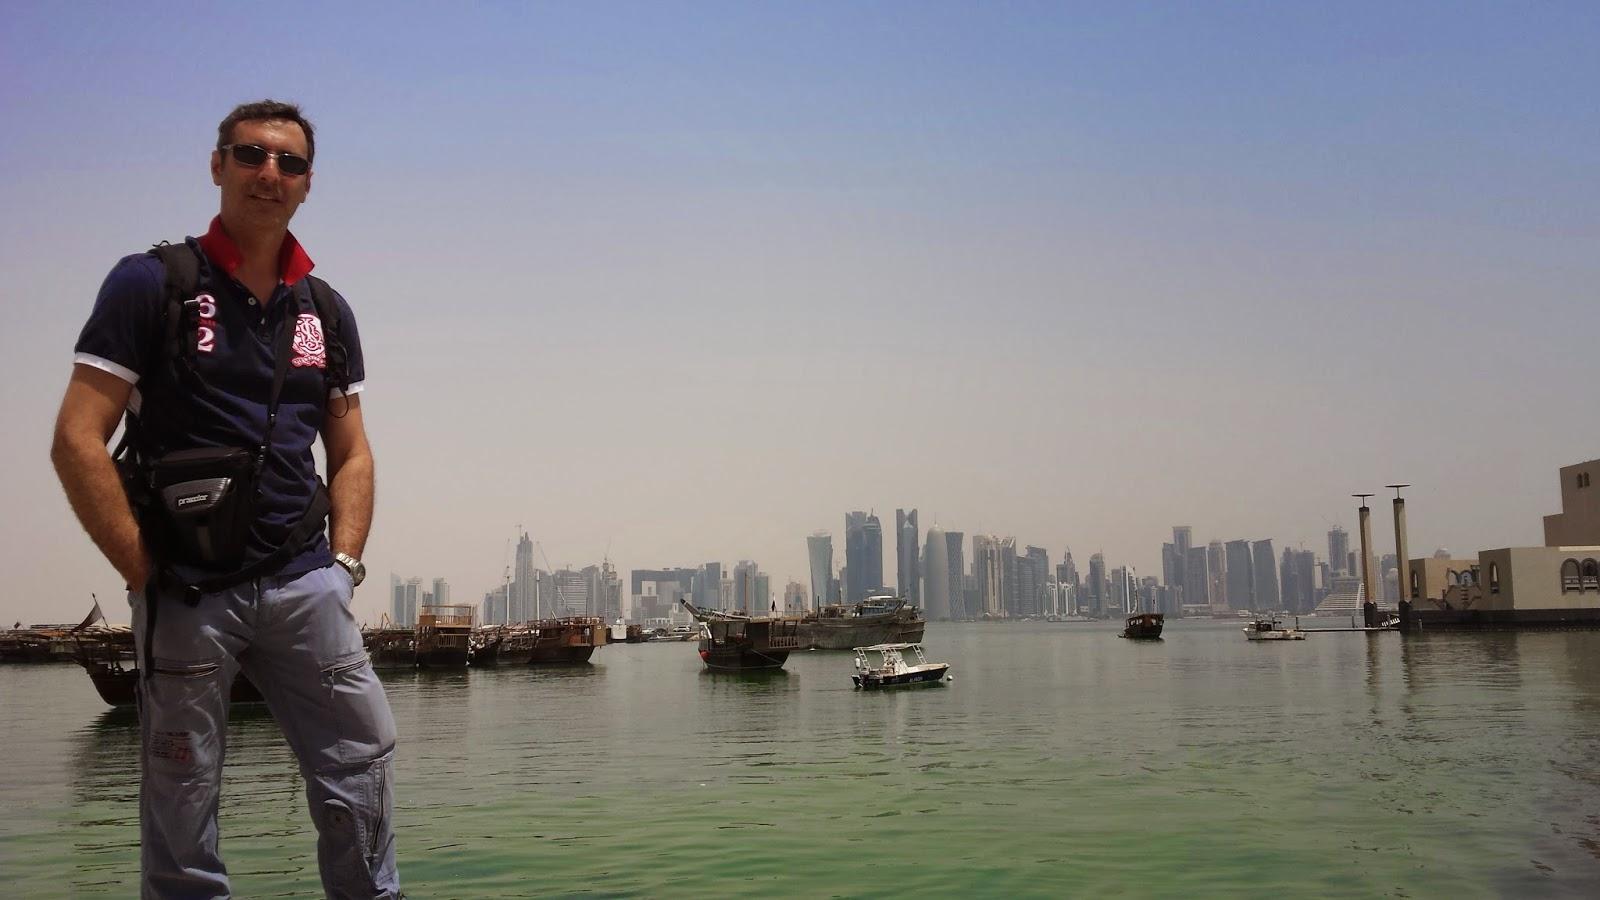 skyline de Doha, Qatar, rascacielos de Doha, Qatar 2022